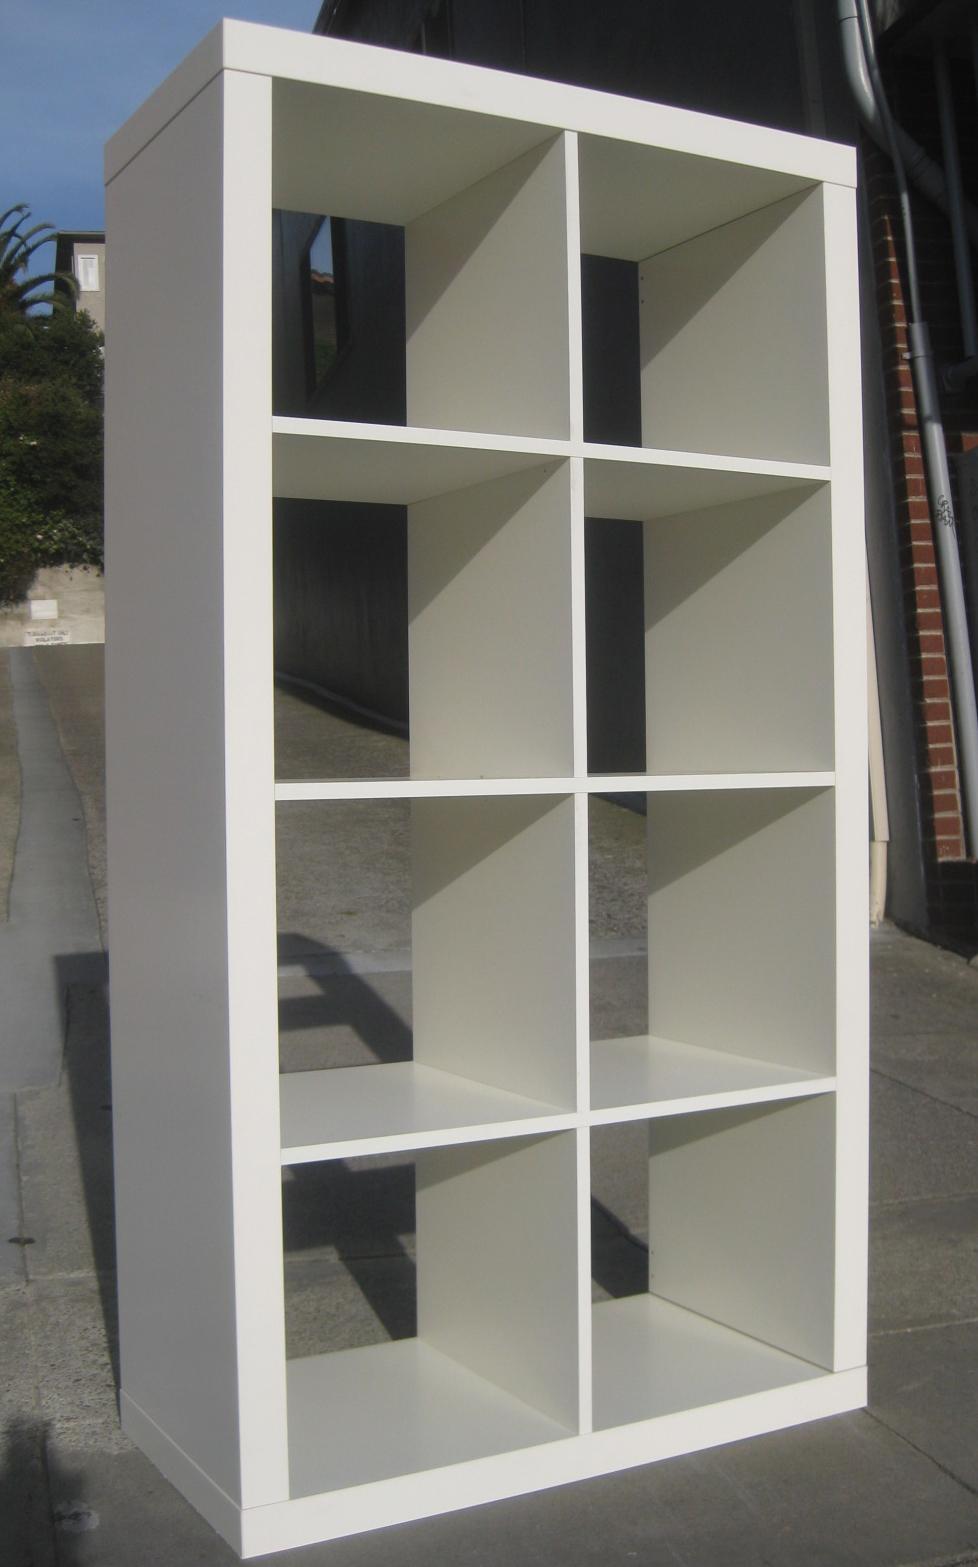 uhuru furniture collectibles sold ikea cube shelf 45. Black Bedroom Furniture Sets. Home Design Ideas